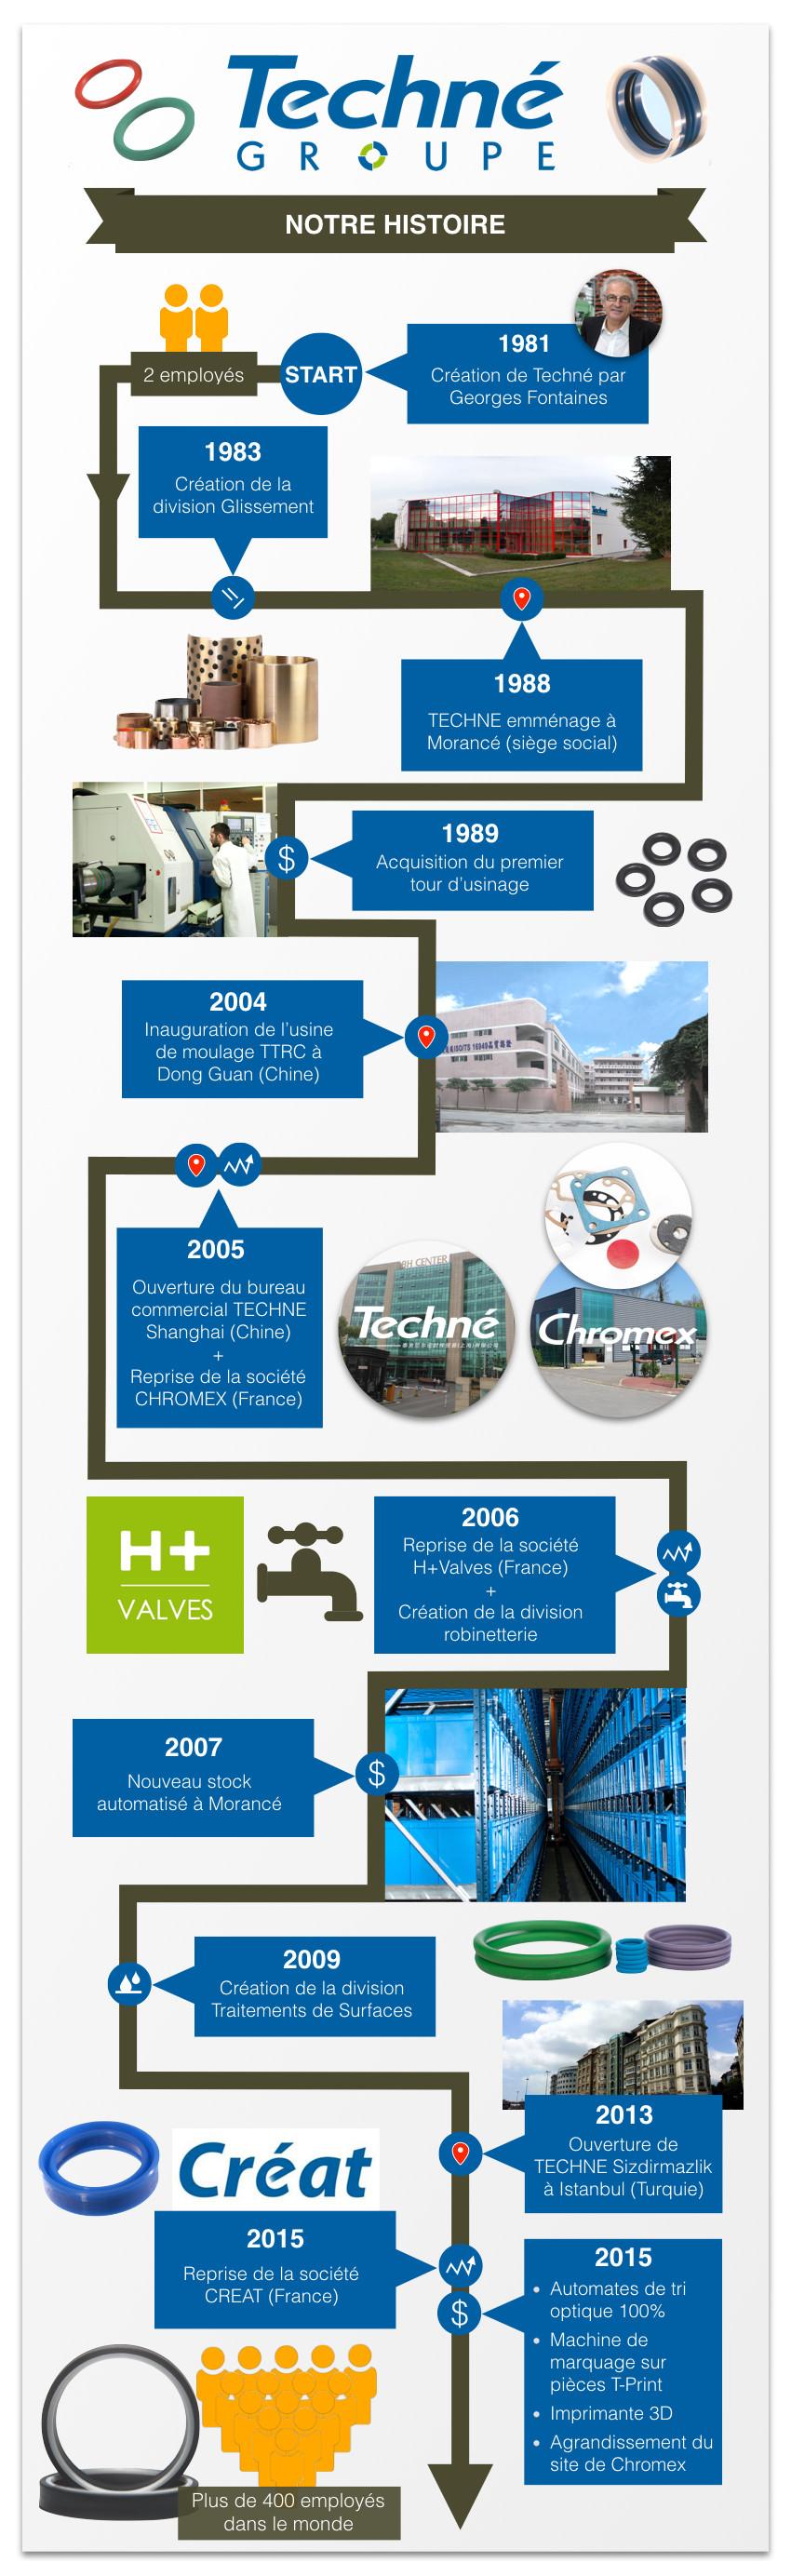 Timeline-Techne-Histoire-Infographie